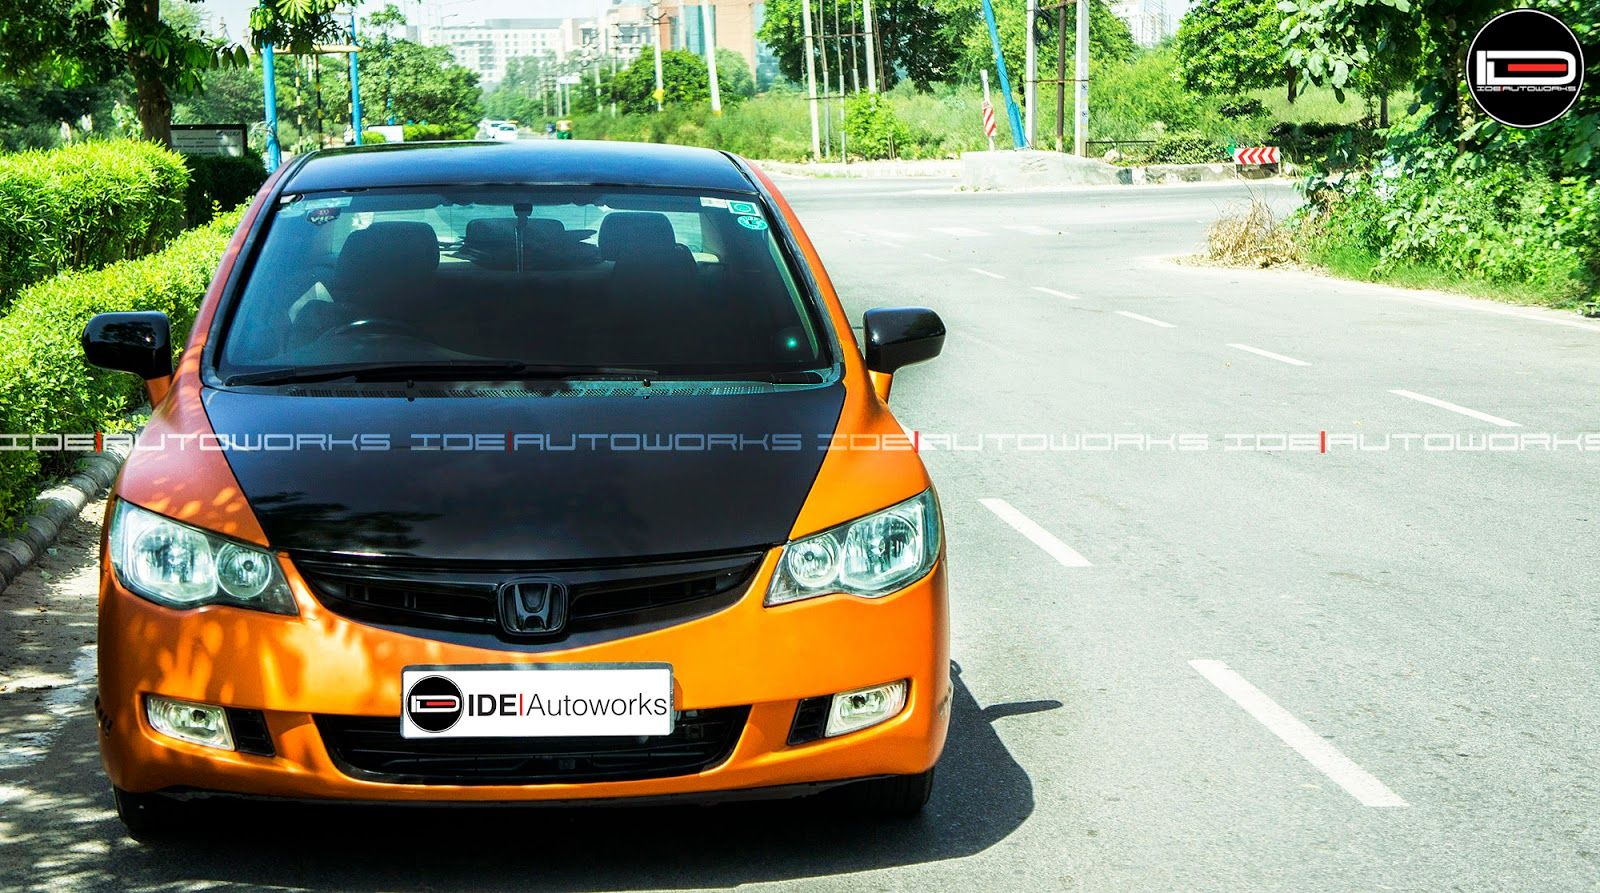 Honda Civic Wrapped In Matte Metallic Orange Honda Hondacivic Ide Ideautoworks Honda Civic Civic Honda